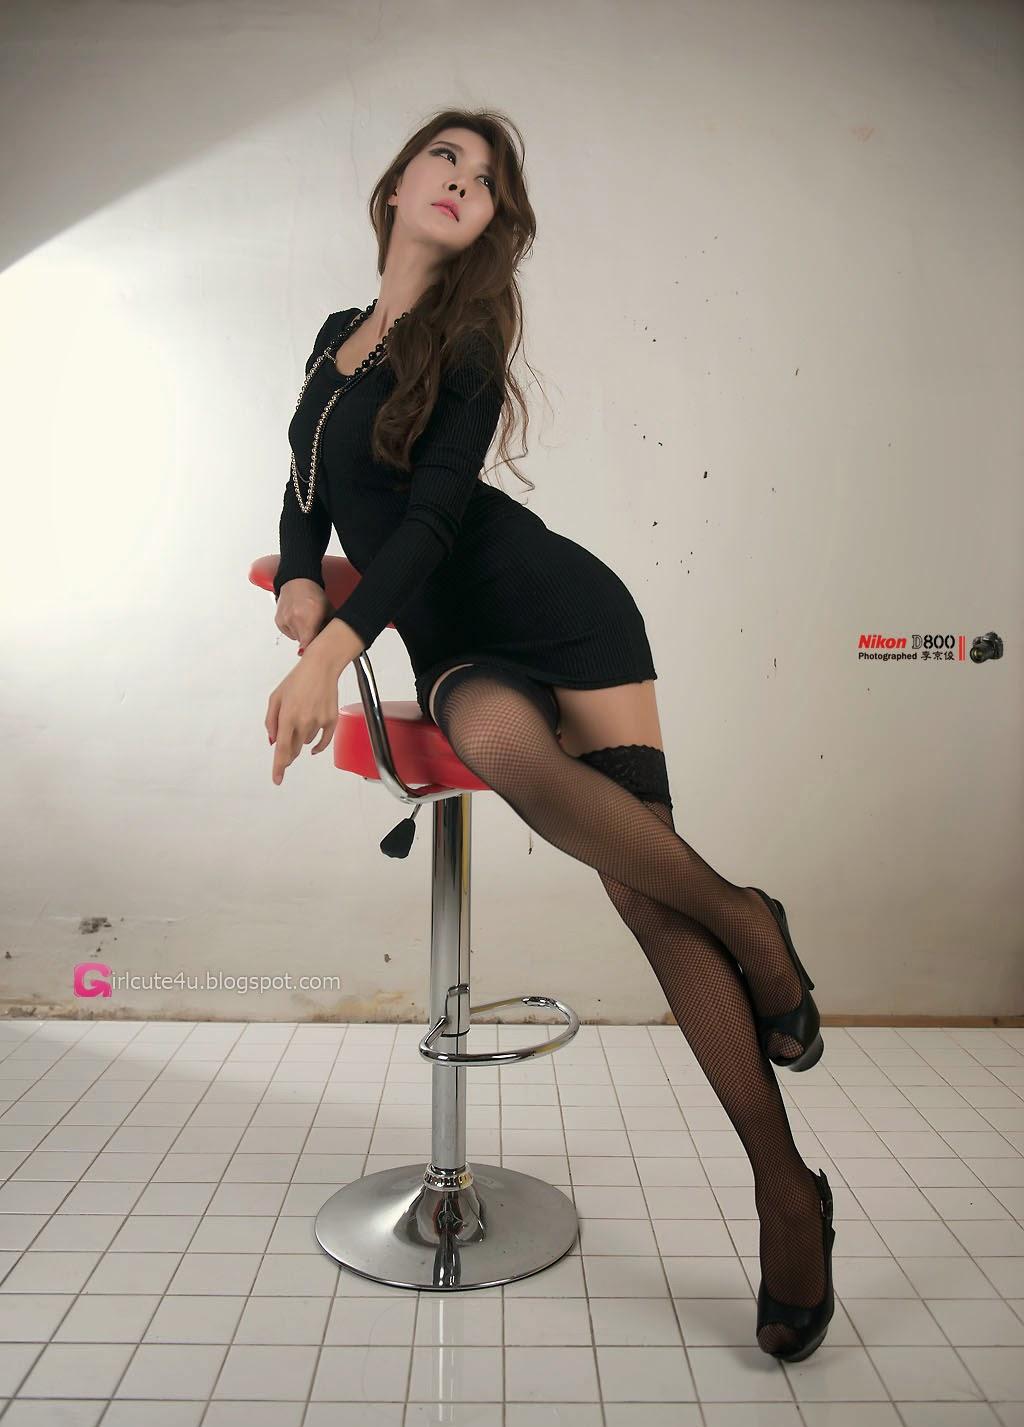 3 Park Hyun Sun - Studio Photo Shoot, 3 Different Outfits - very cute asian girl-girlcute4u.blogspot.com